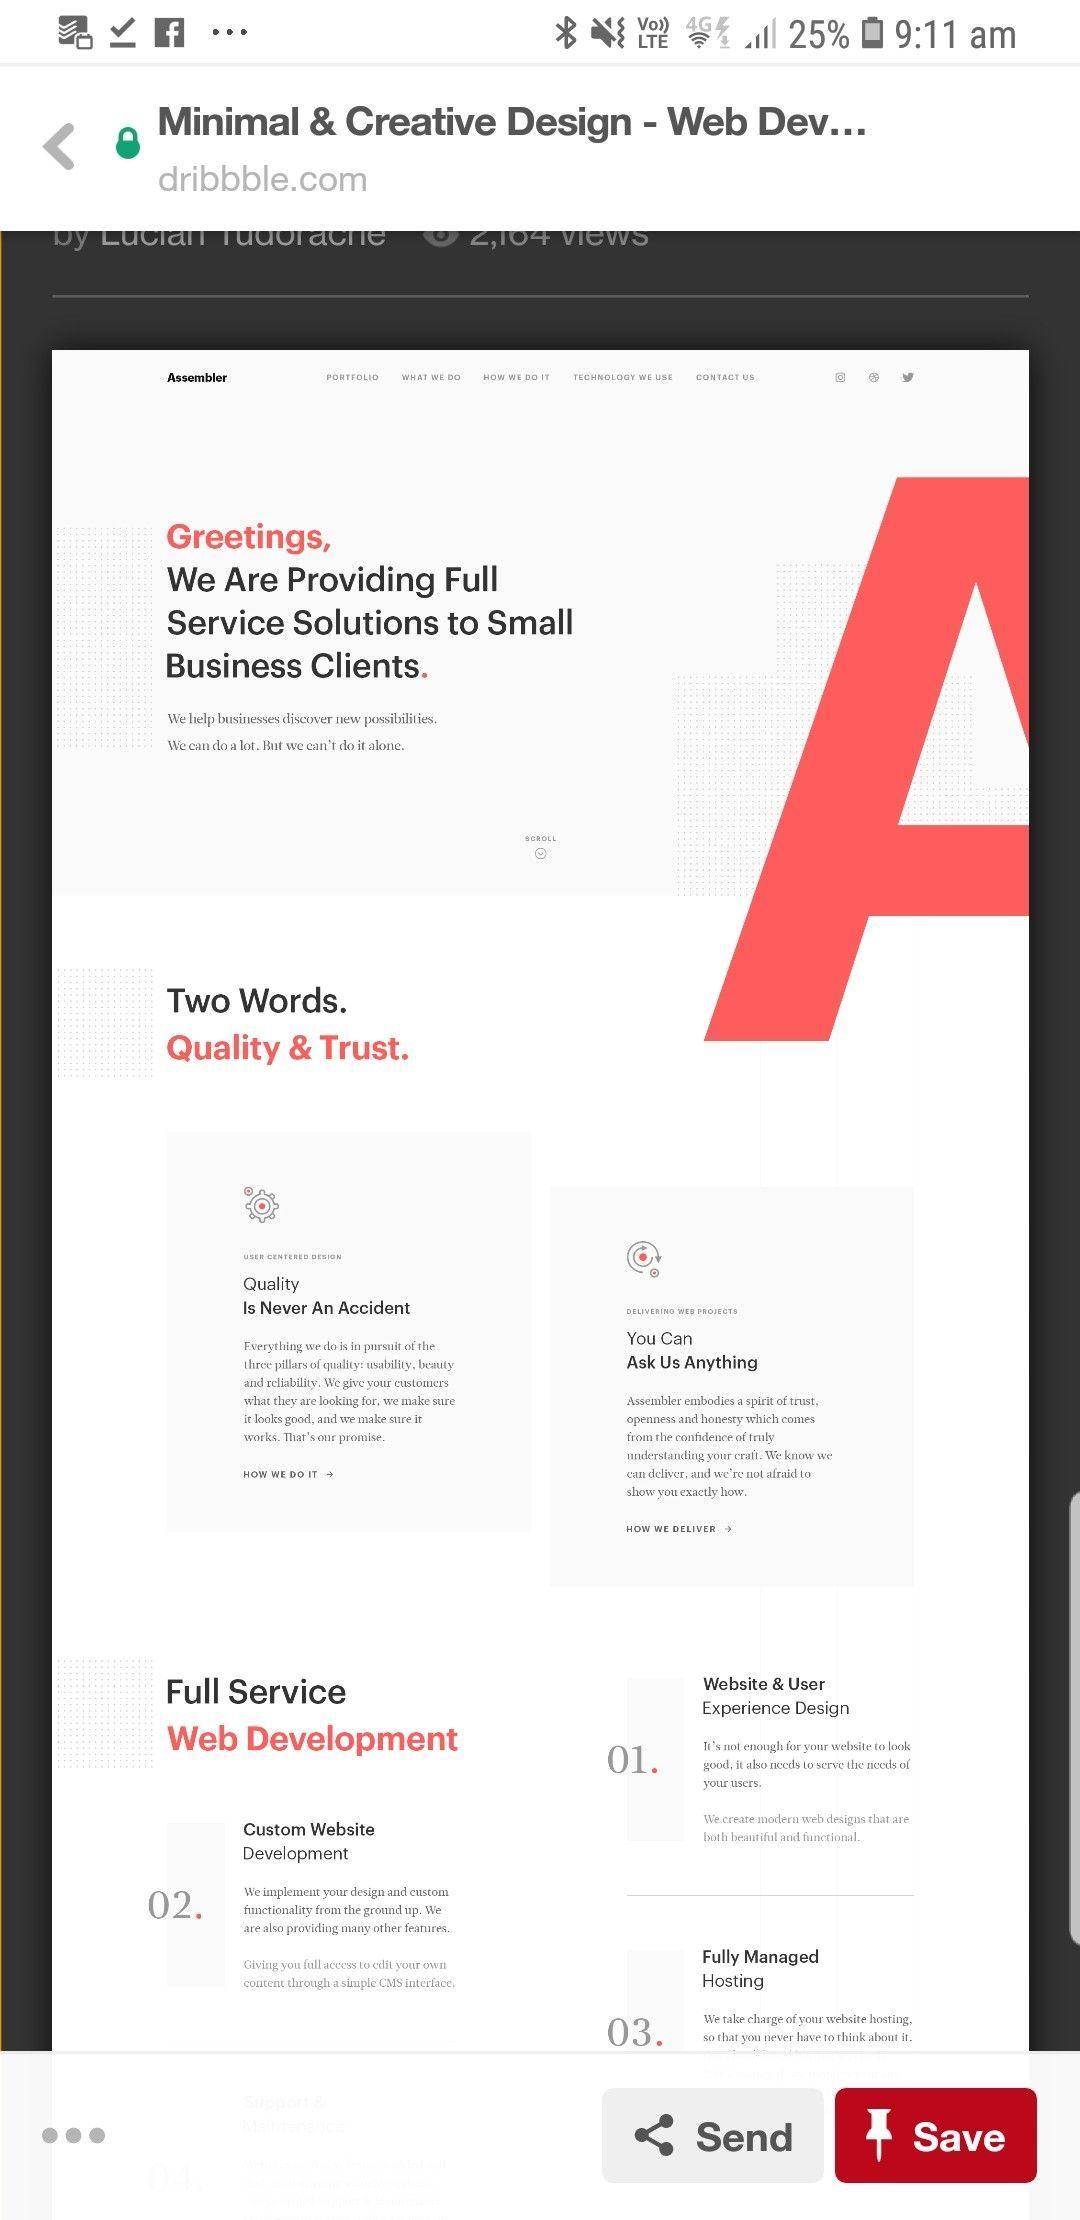 Minimalist Website Design In 2020 Minimalist Web Design Simple Web Design Web Design